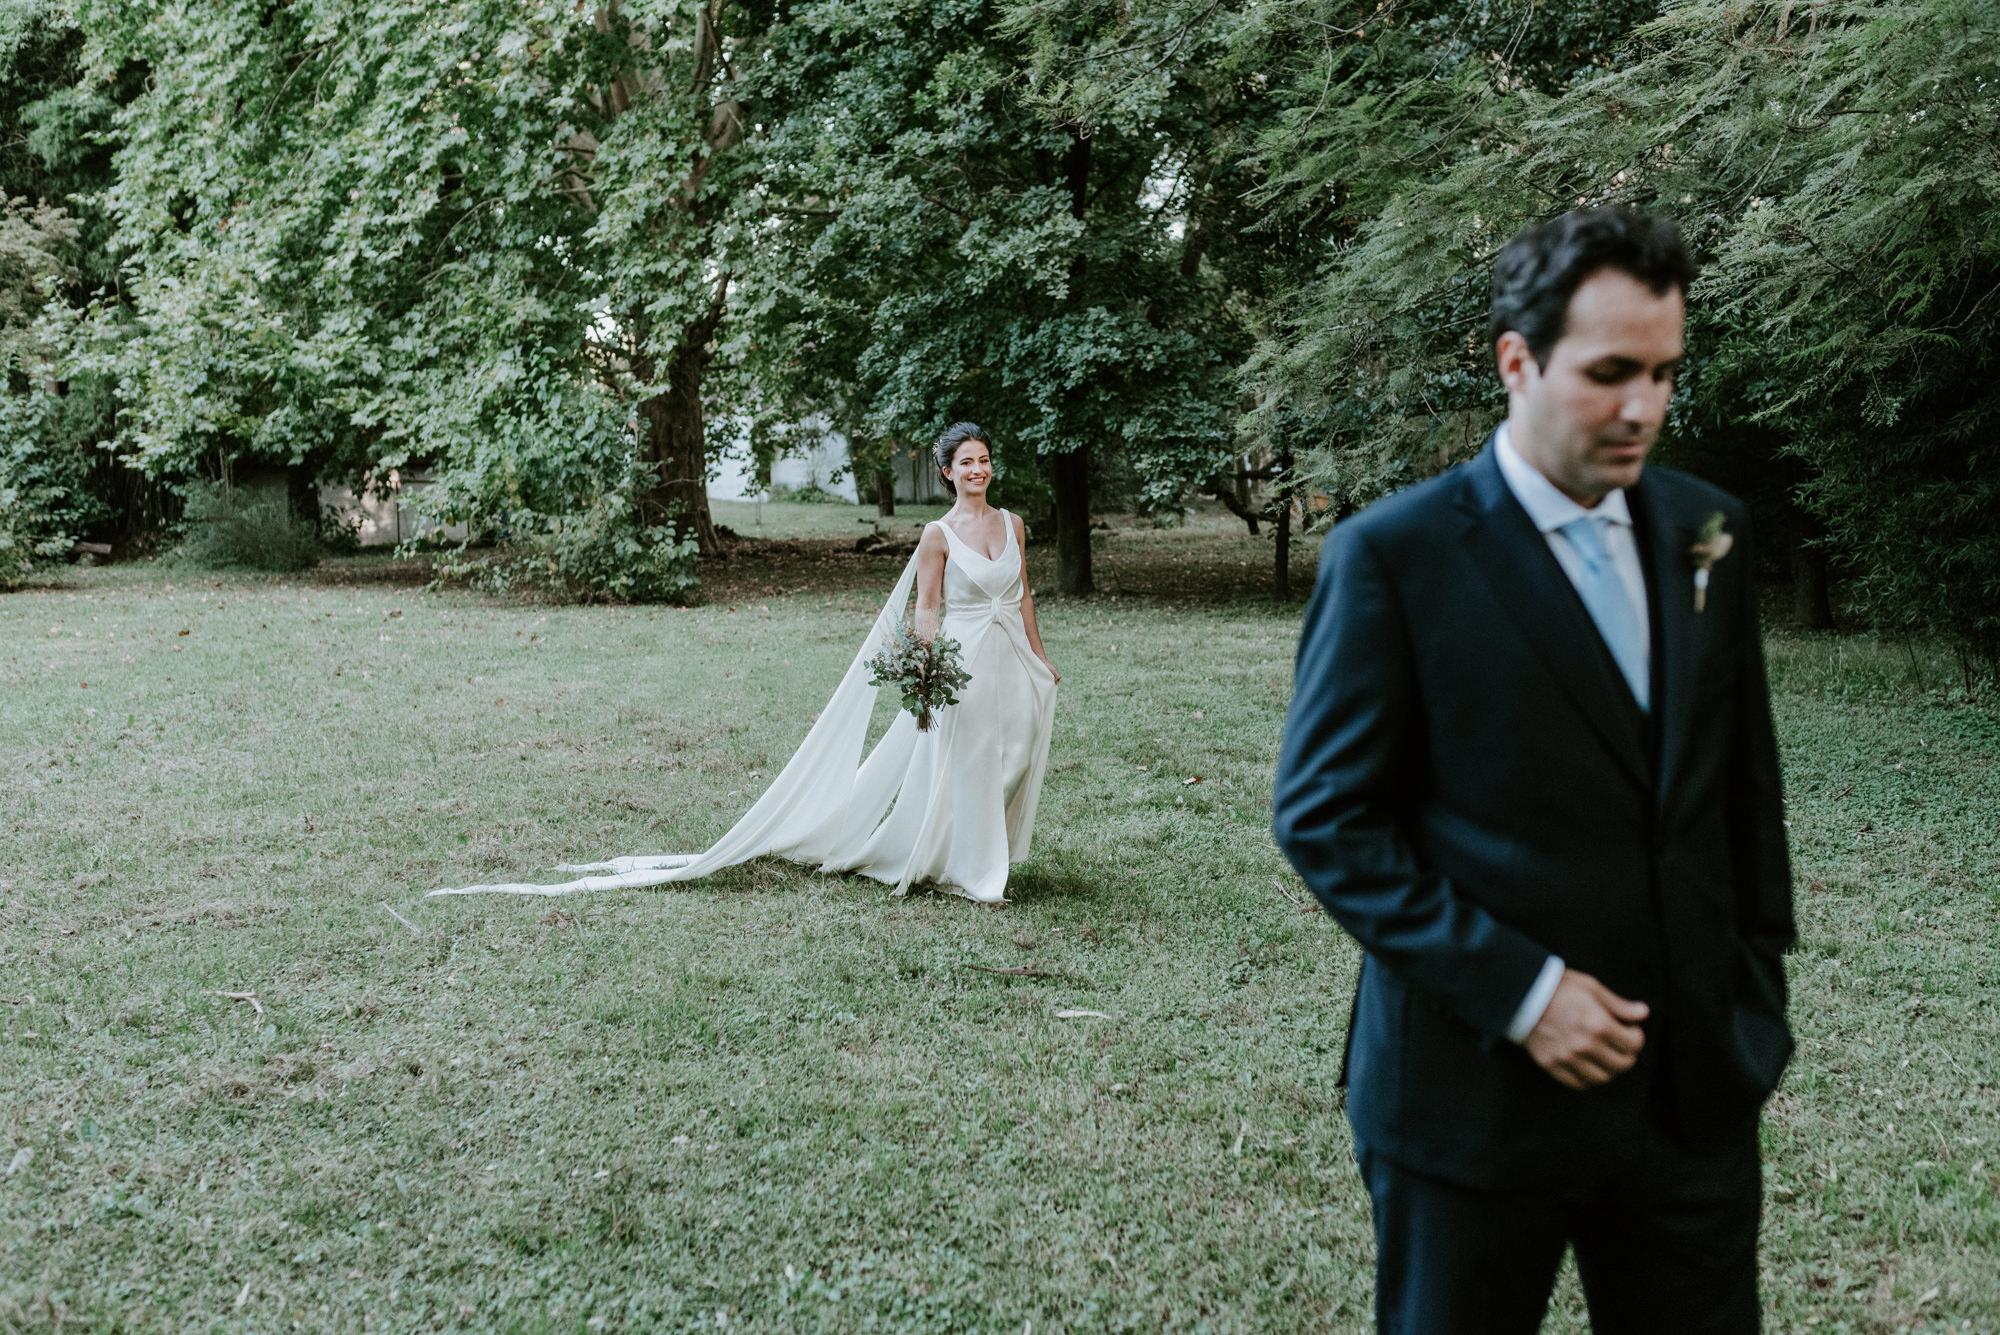 photography, mauricio,garay,wedding, fotografo ,photographer-228.jpg